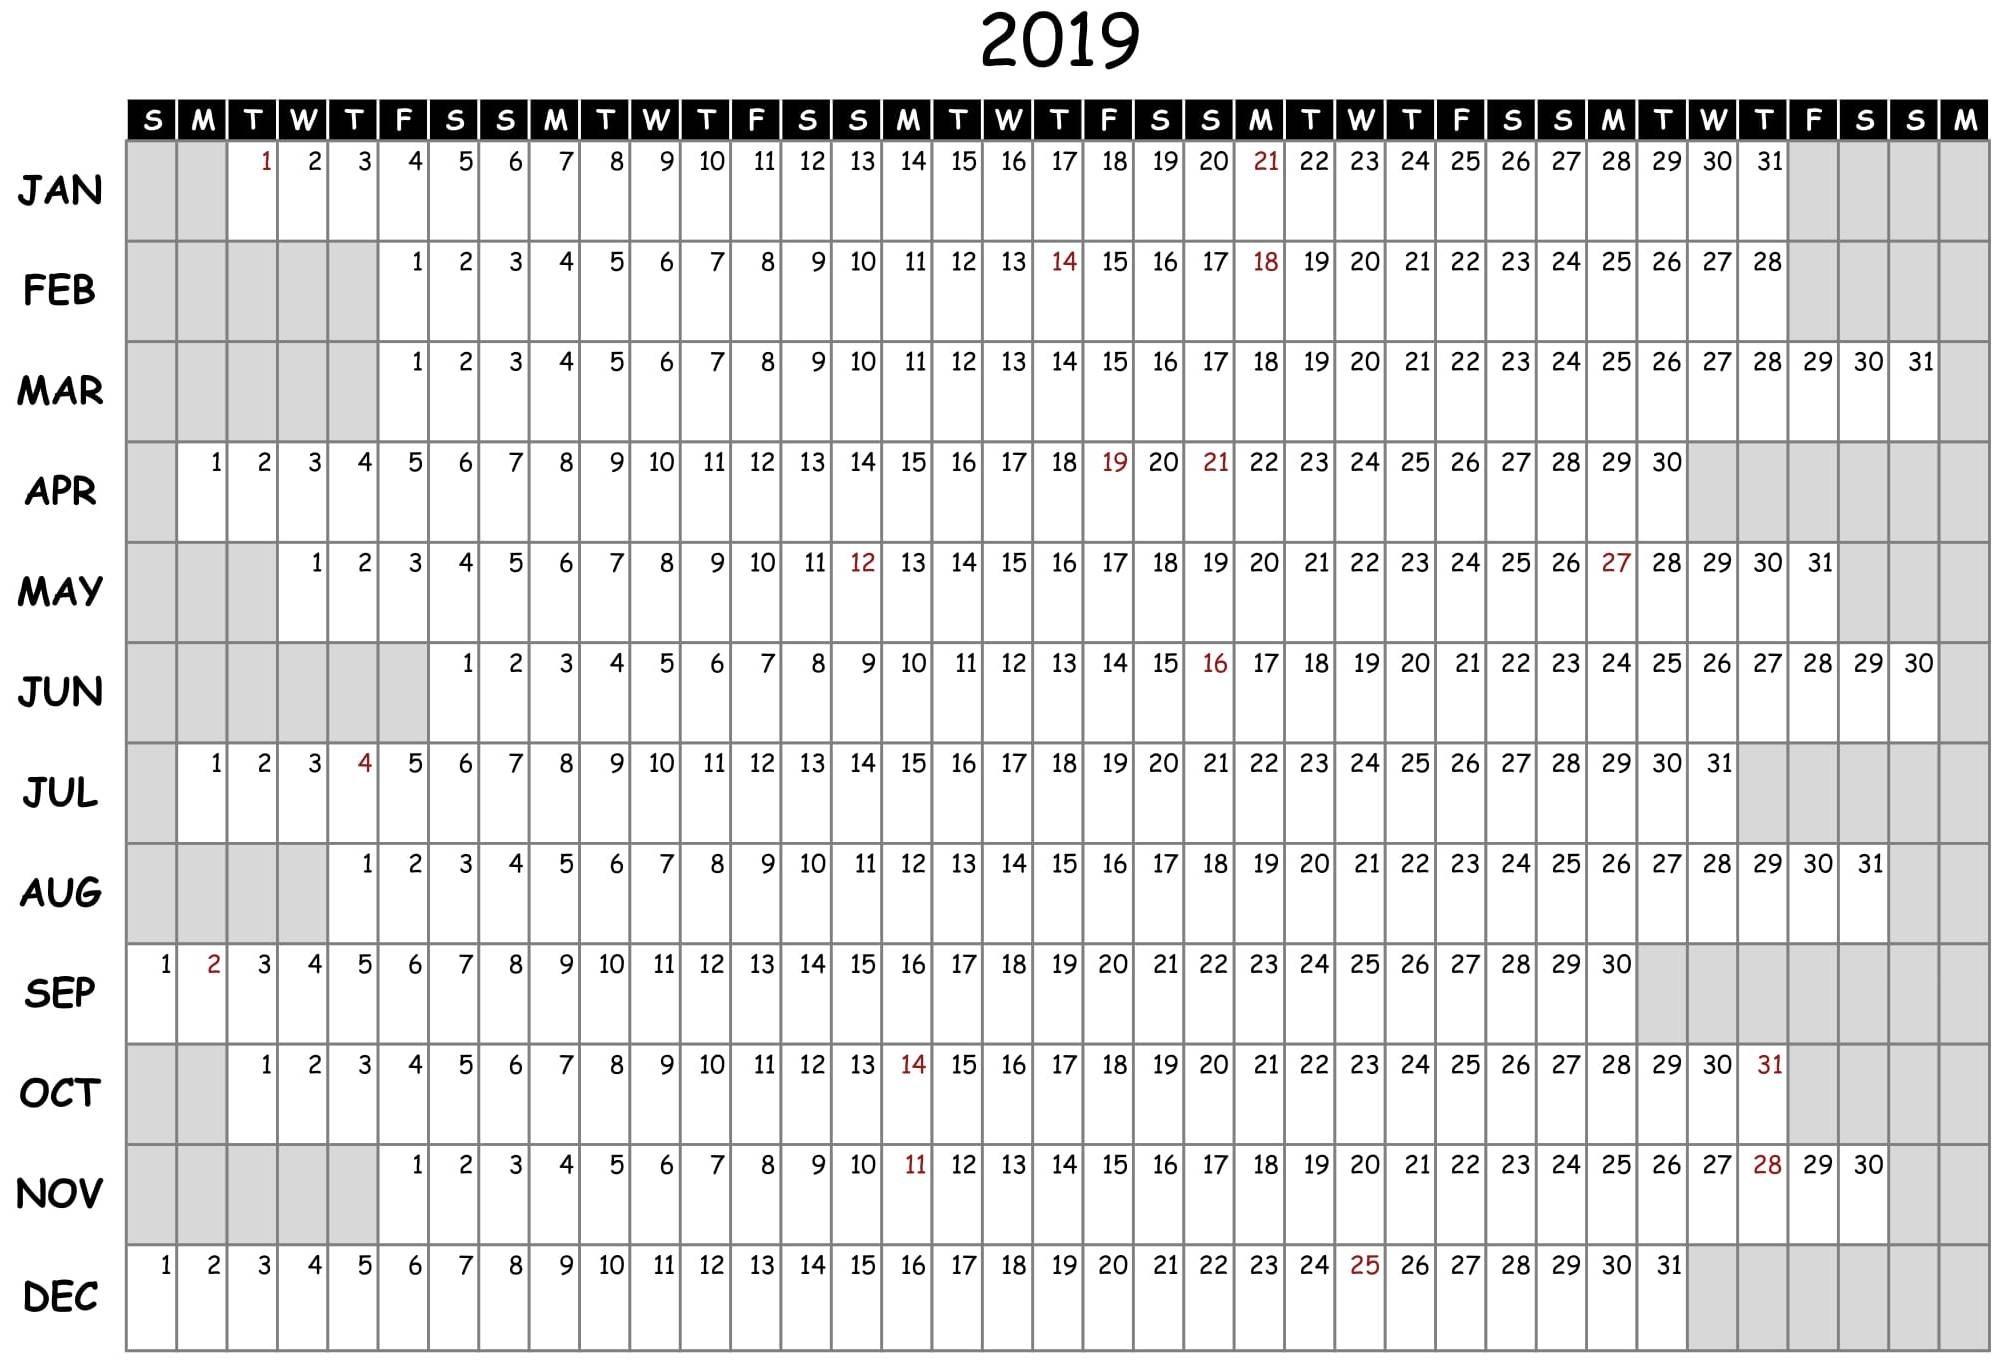 Free Printable 2020 Employee Attendance Calendar - Colona for 2020 Employee Attendance Calendar Printable